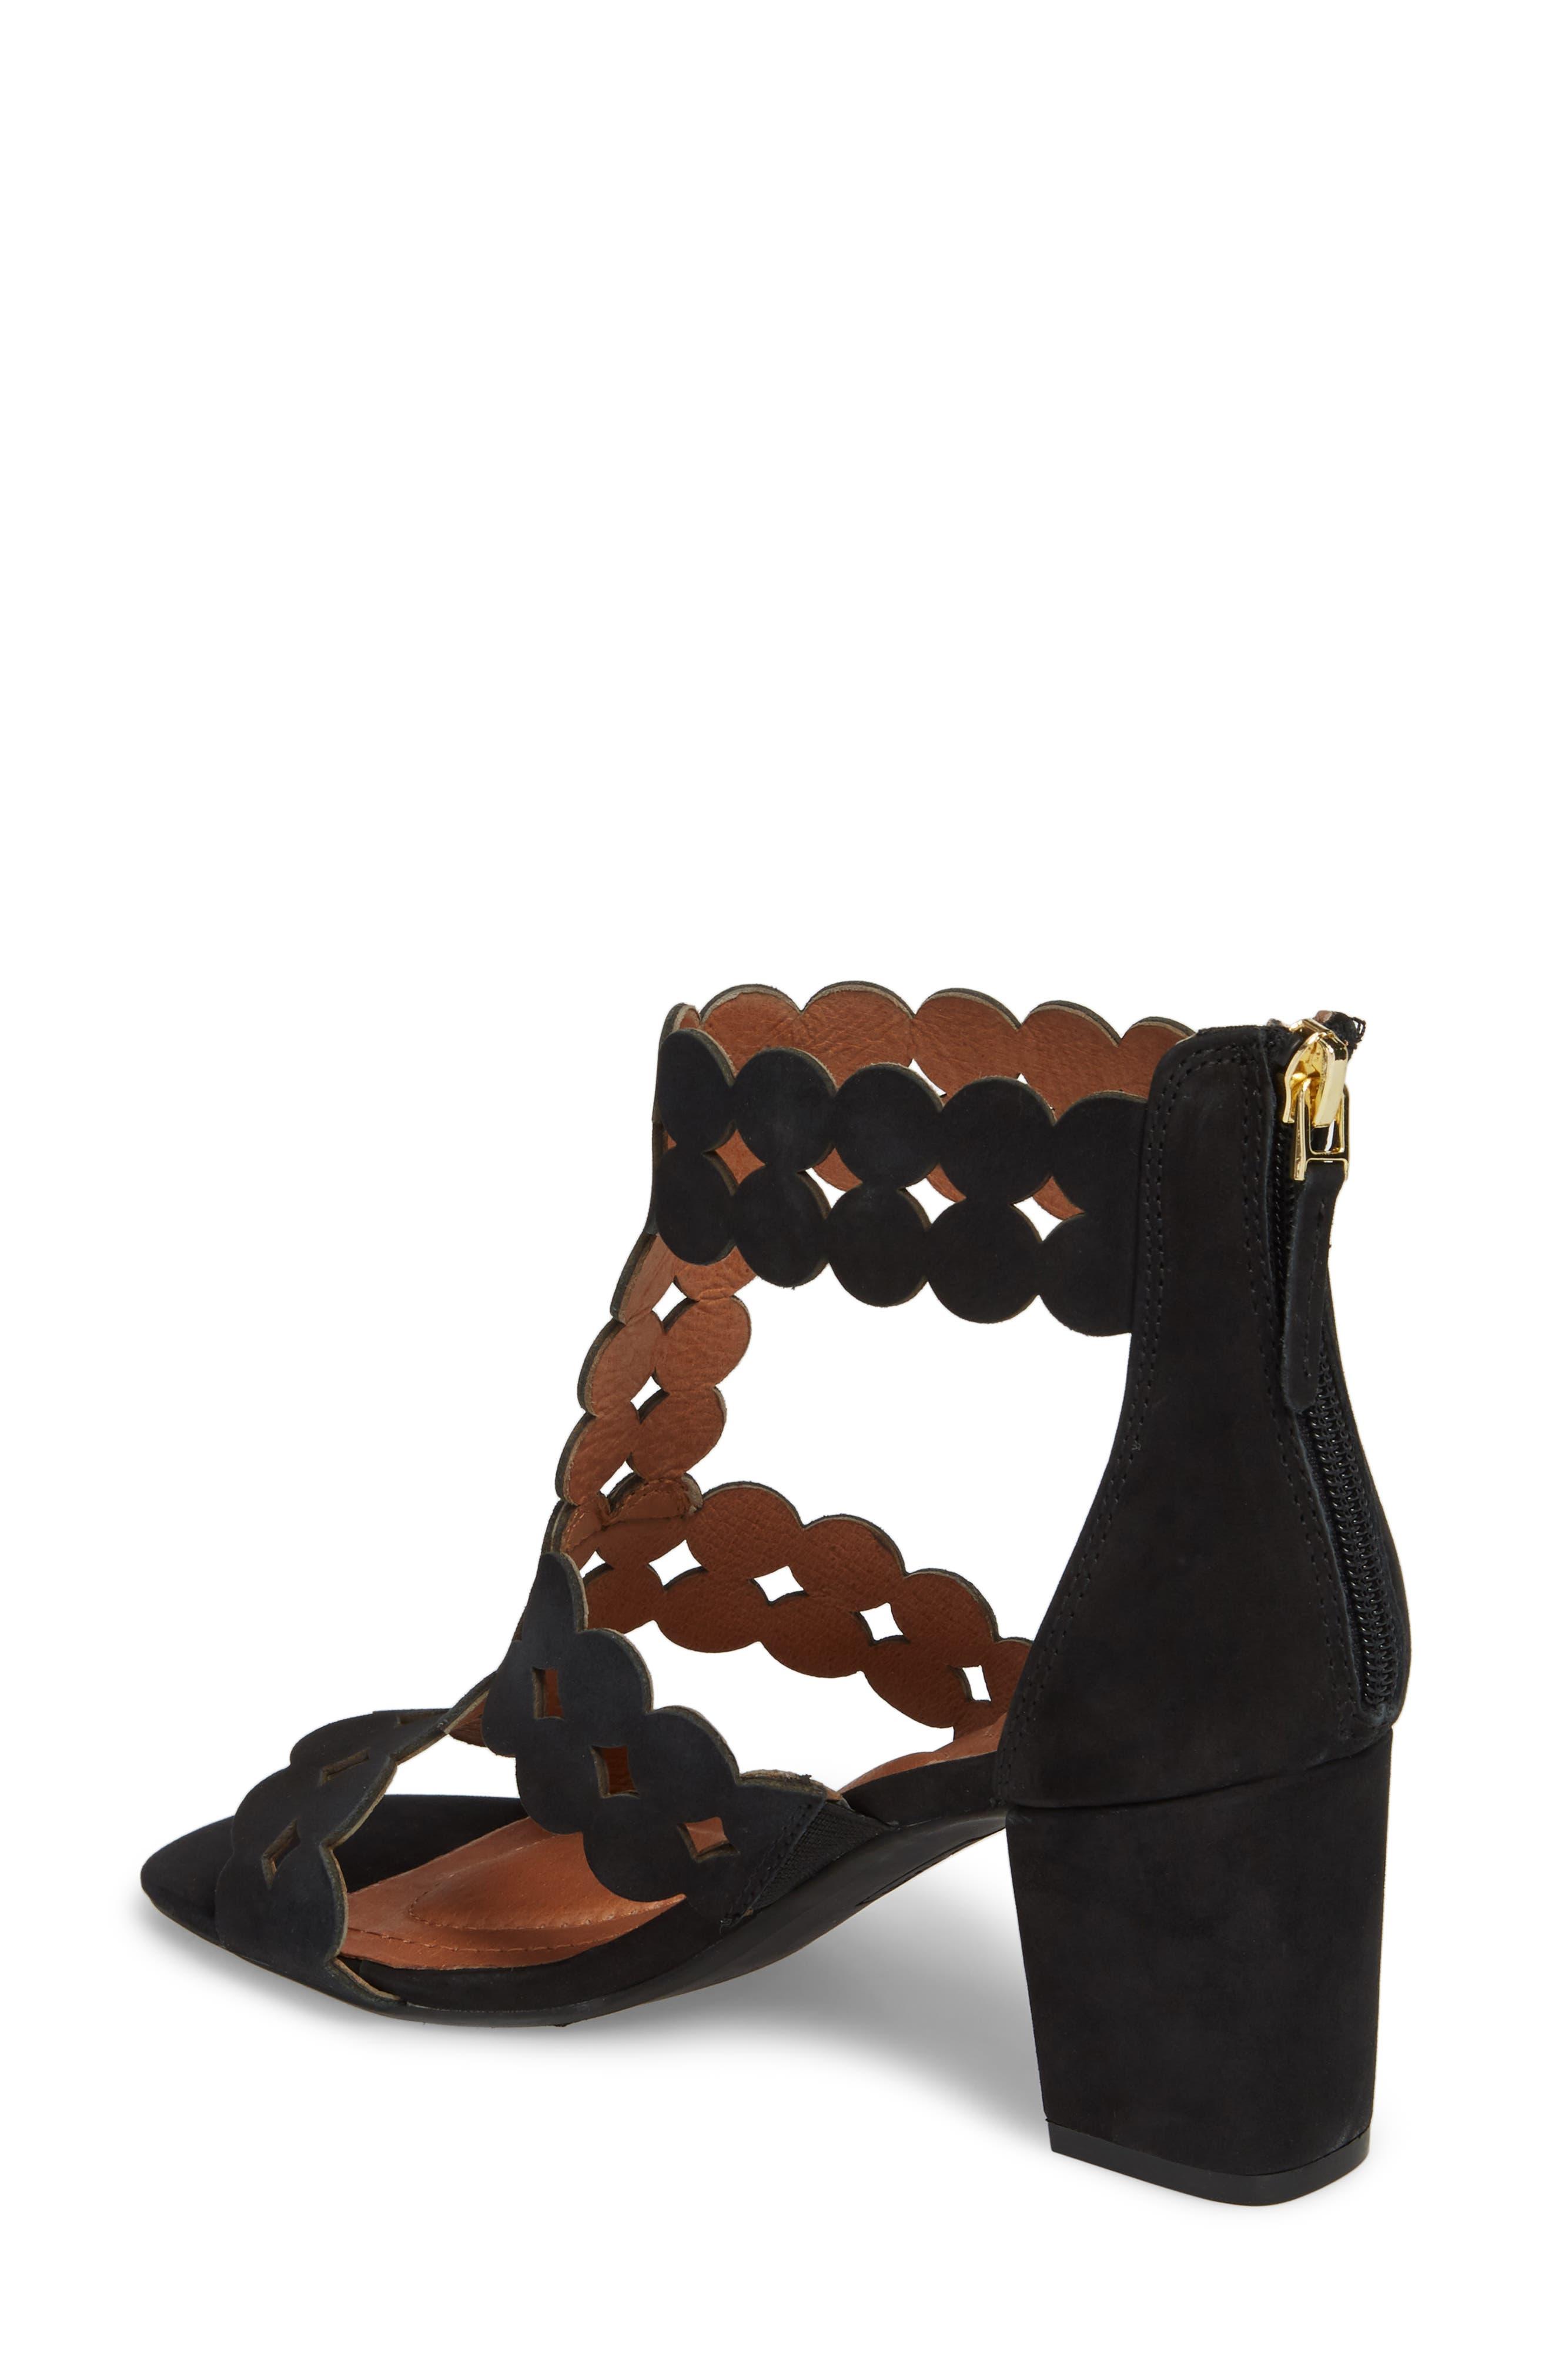 SUDINI,                             Novara Block Heel Sandal,                             Alternate thumbnail 2, color,                             BLACK NUBUCK LEATHER